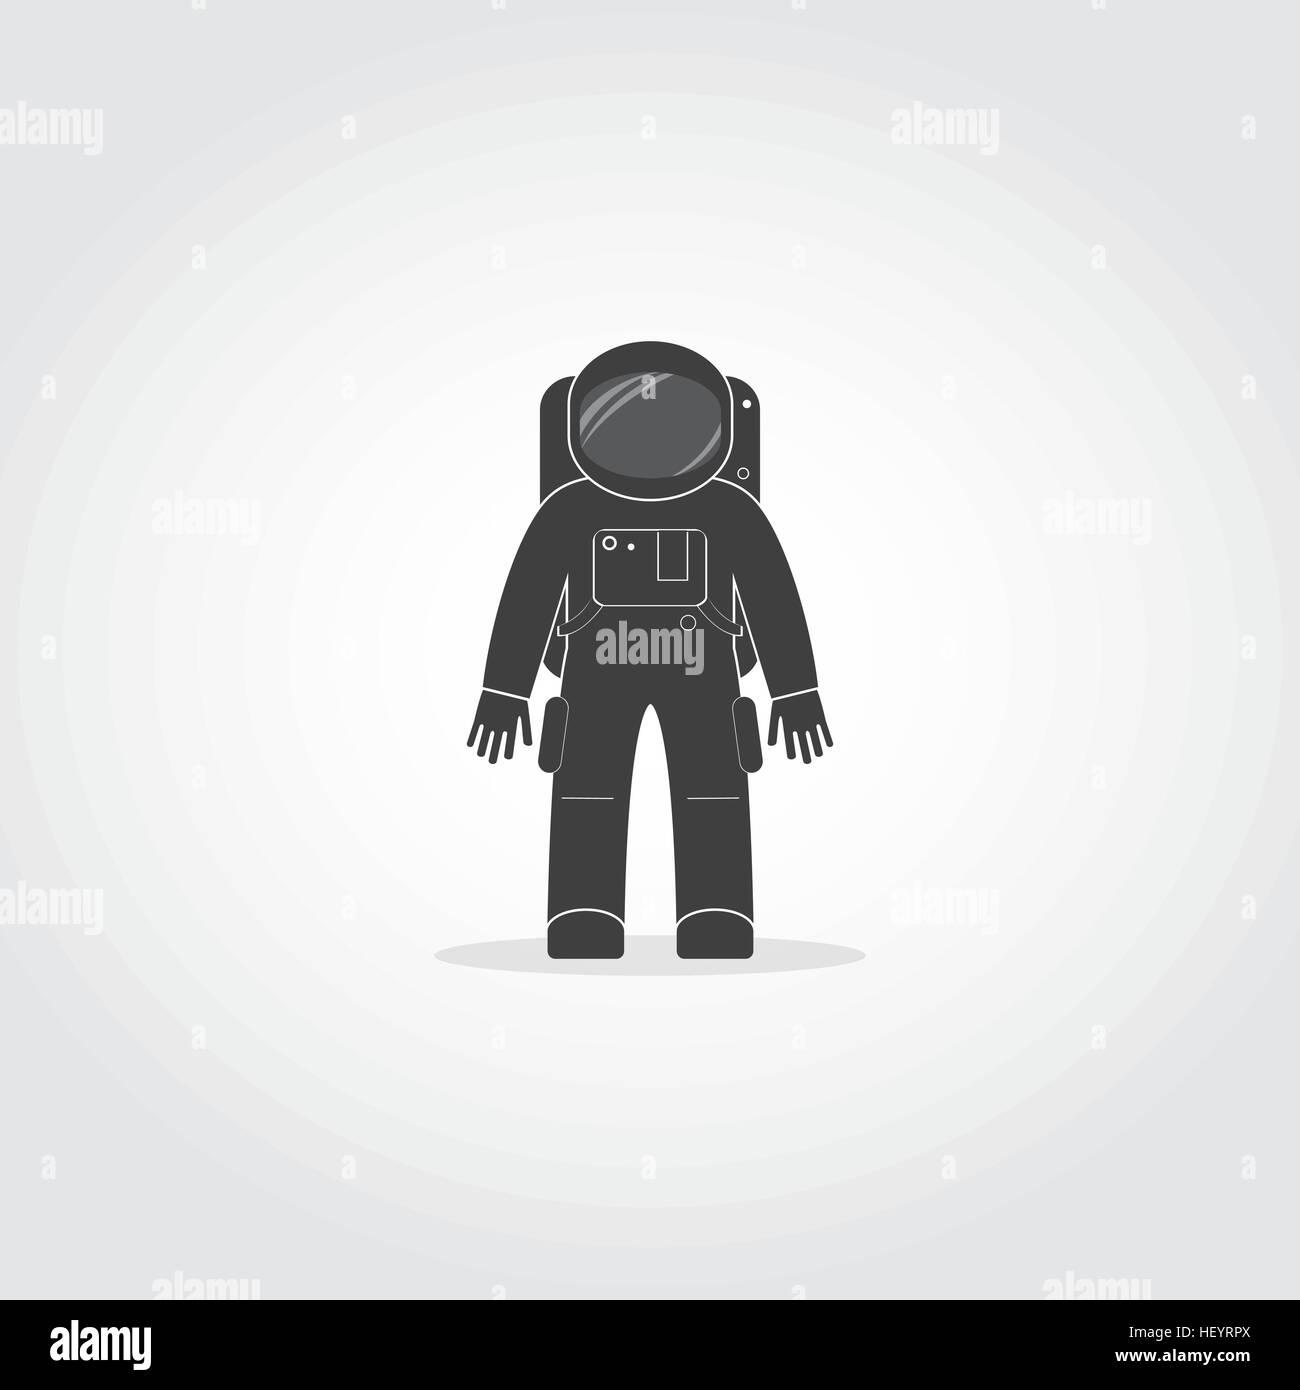 cosmonaut space suit silhouette - photo #34